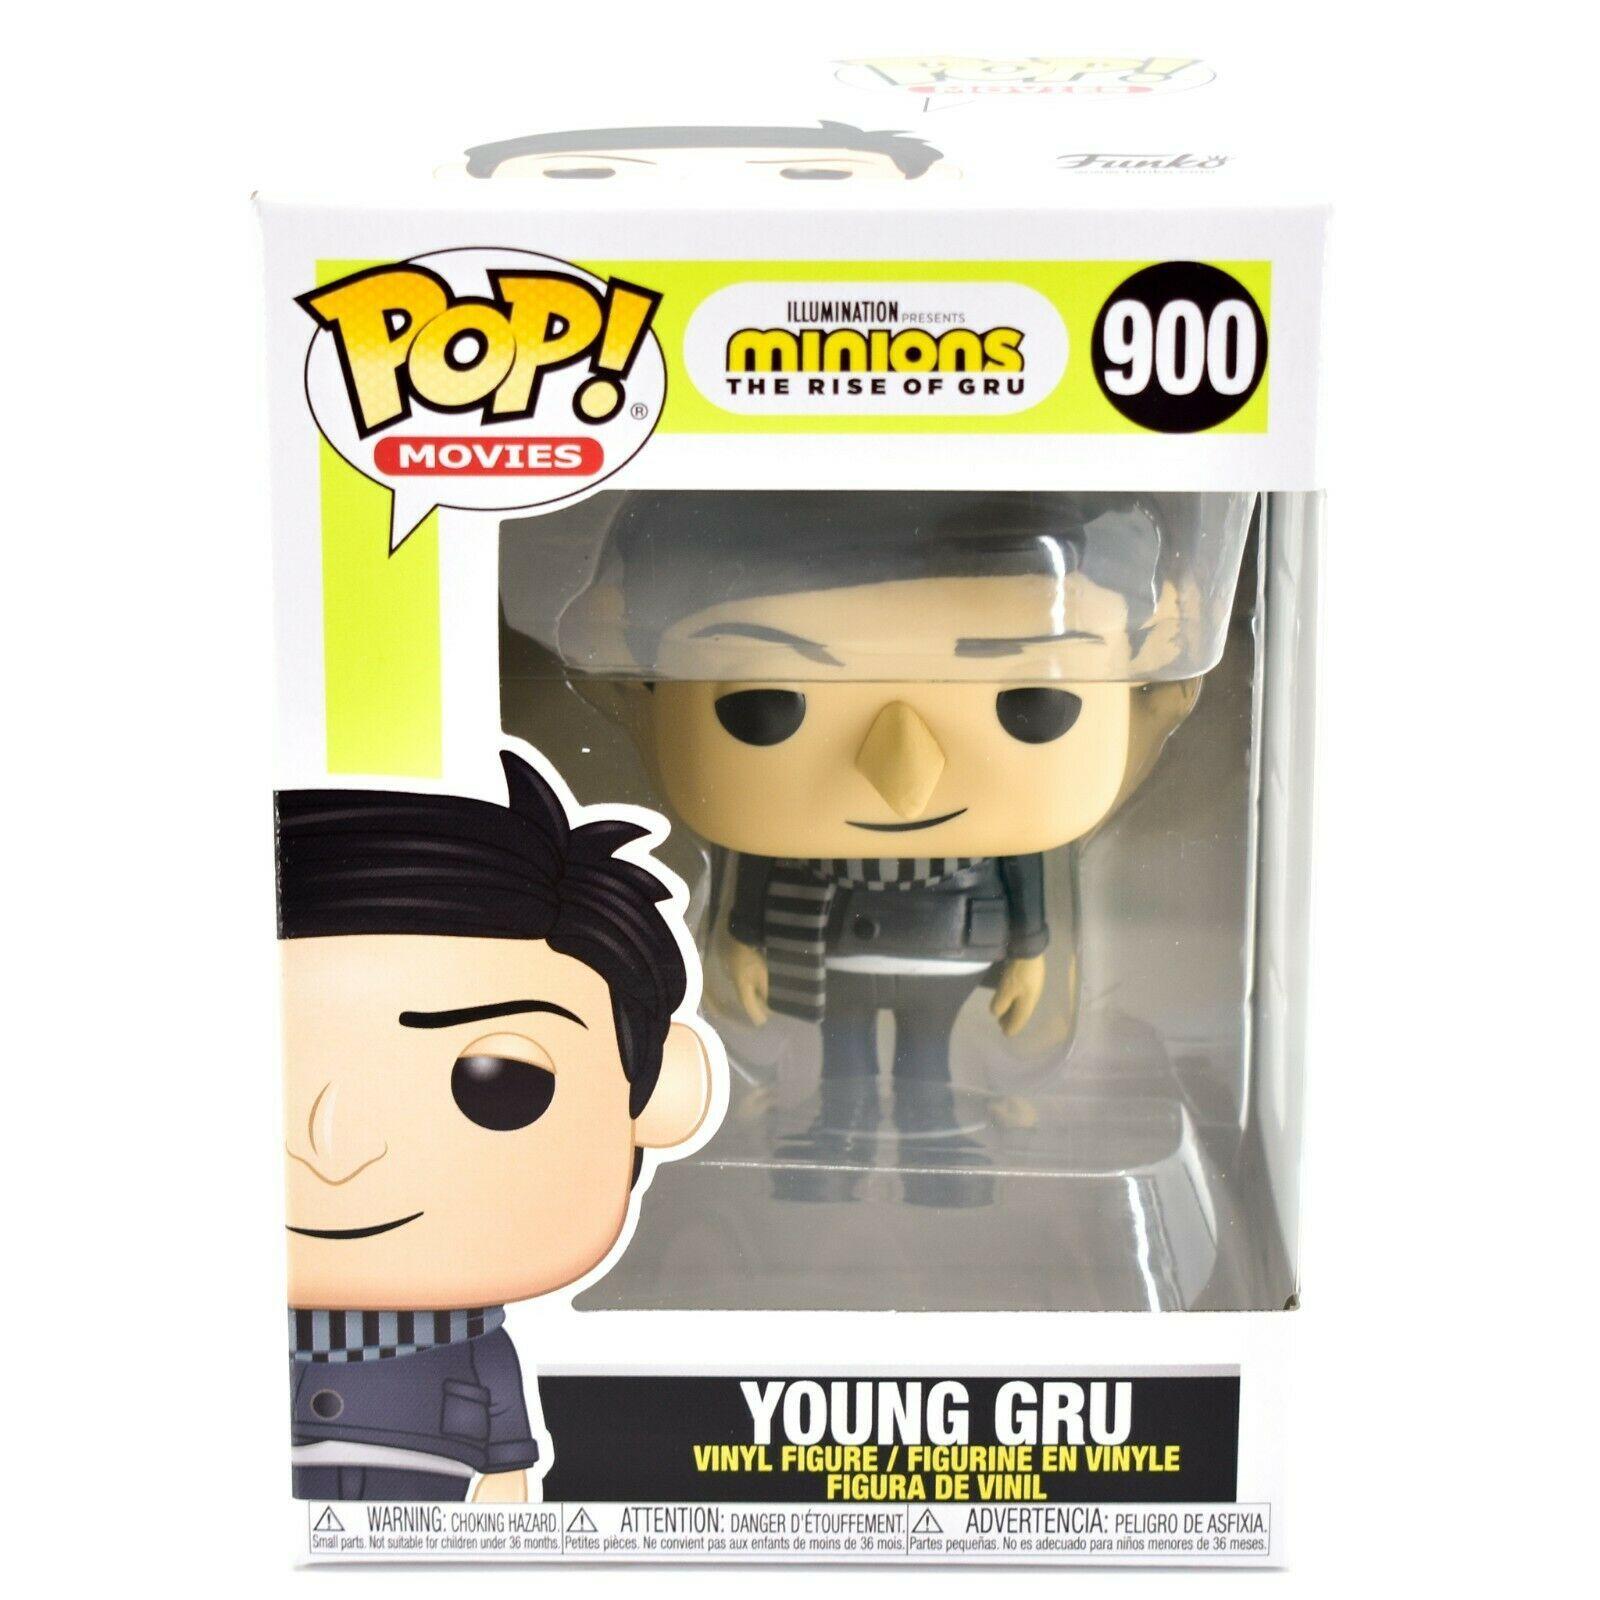 Funko Pop! Movies Minions The Rise of Gru Young Gru #900 Vinyl Figure